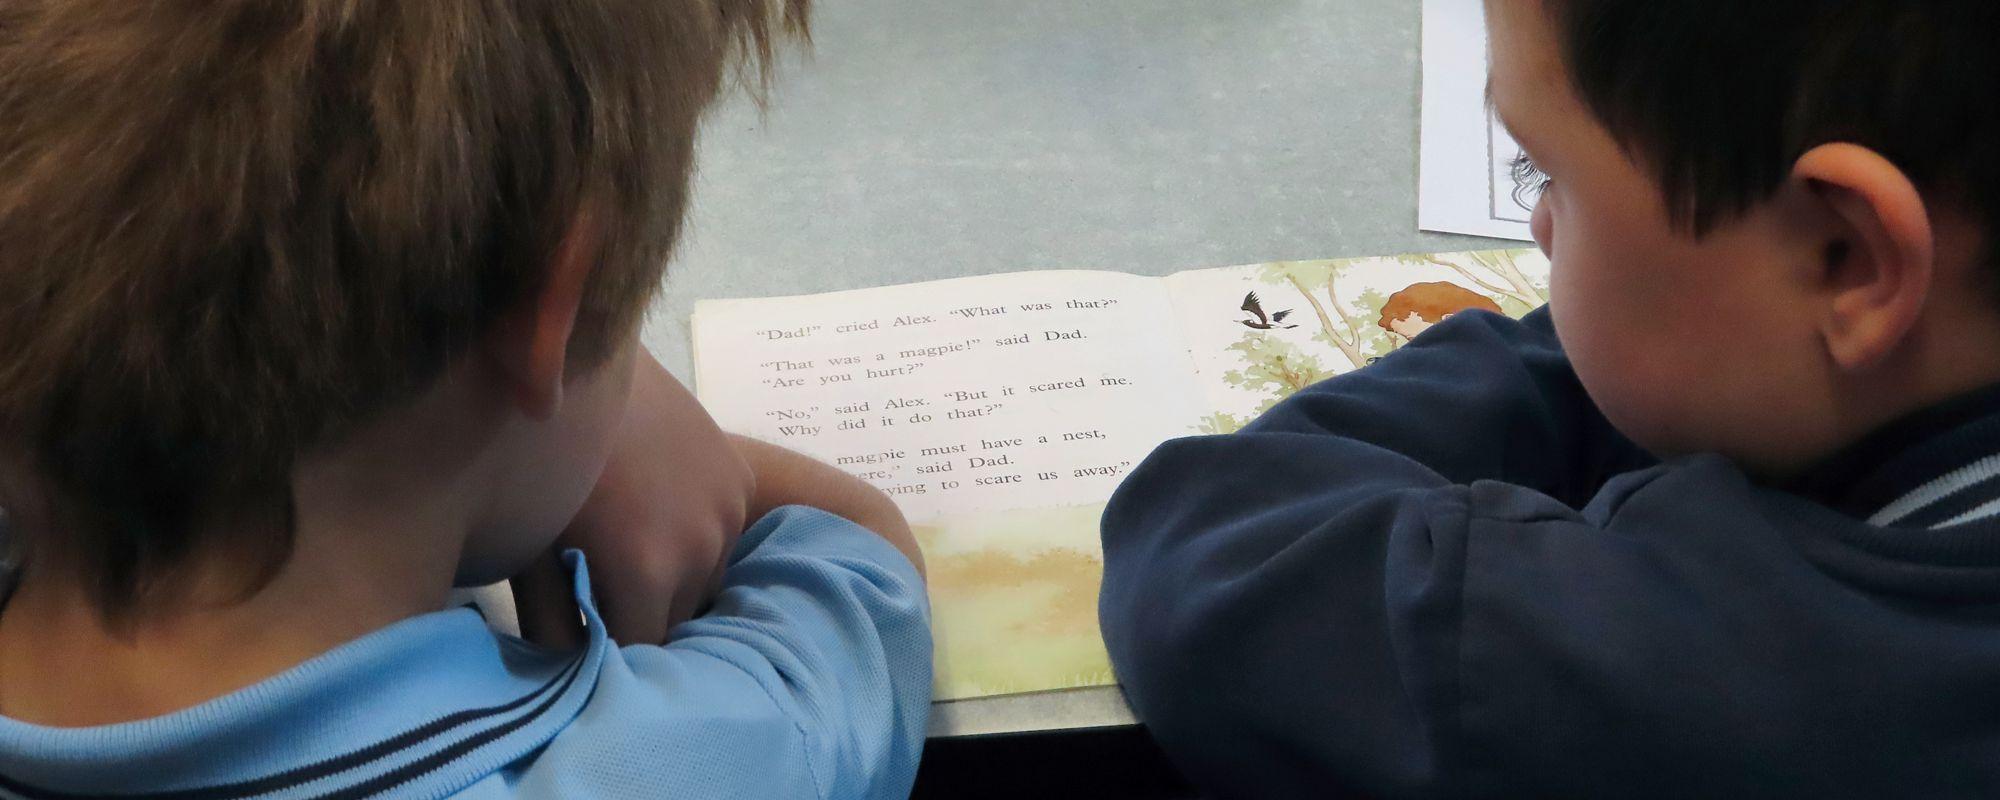 Strathaird Primary School - Strathaird Primary School